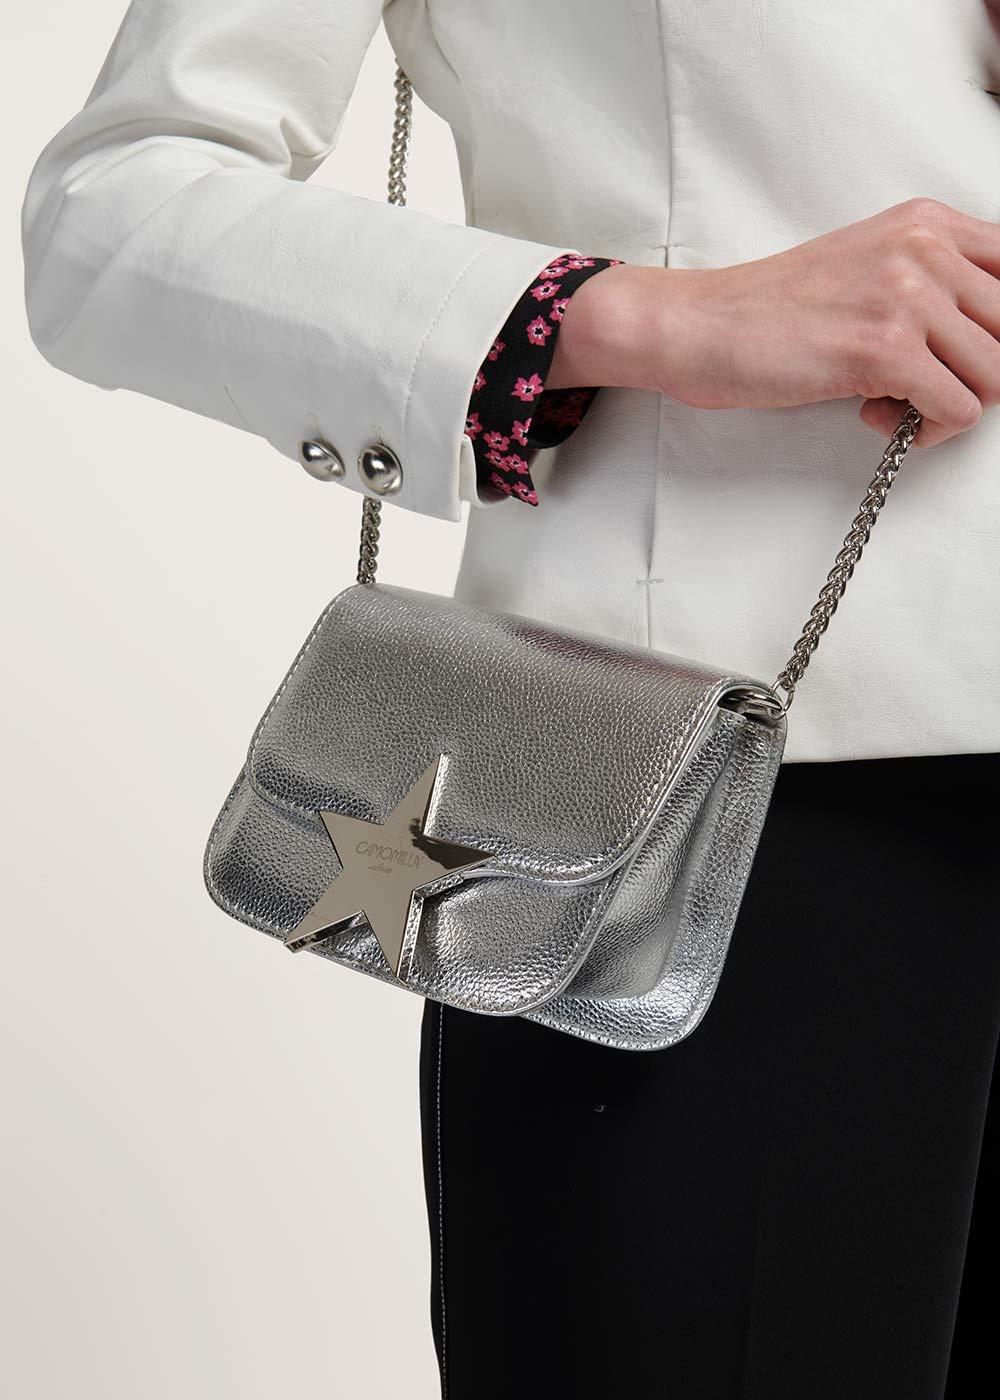 Brandy clutch bag with shoulder strap - Silver - Woman